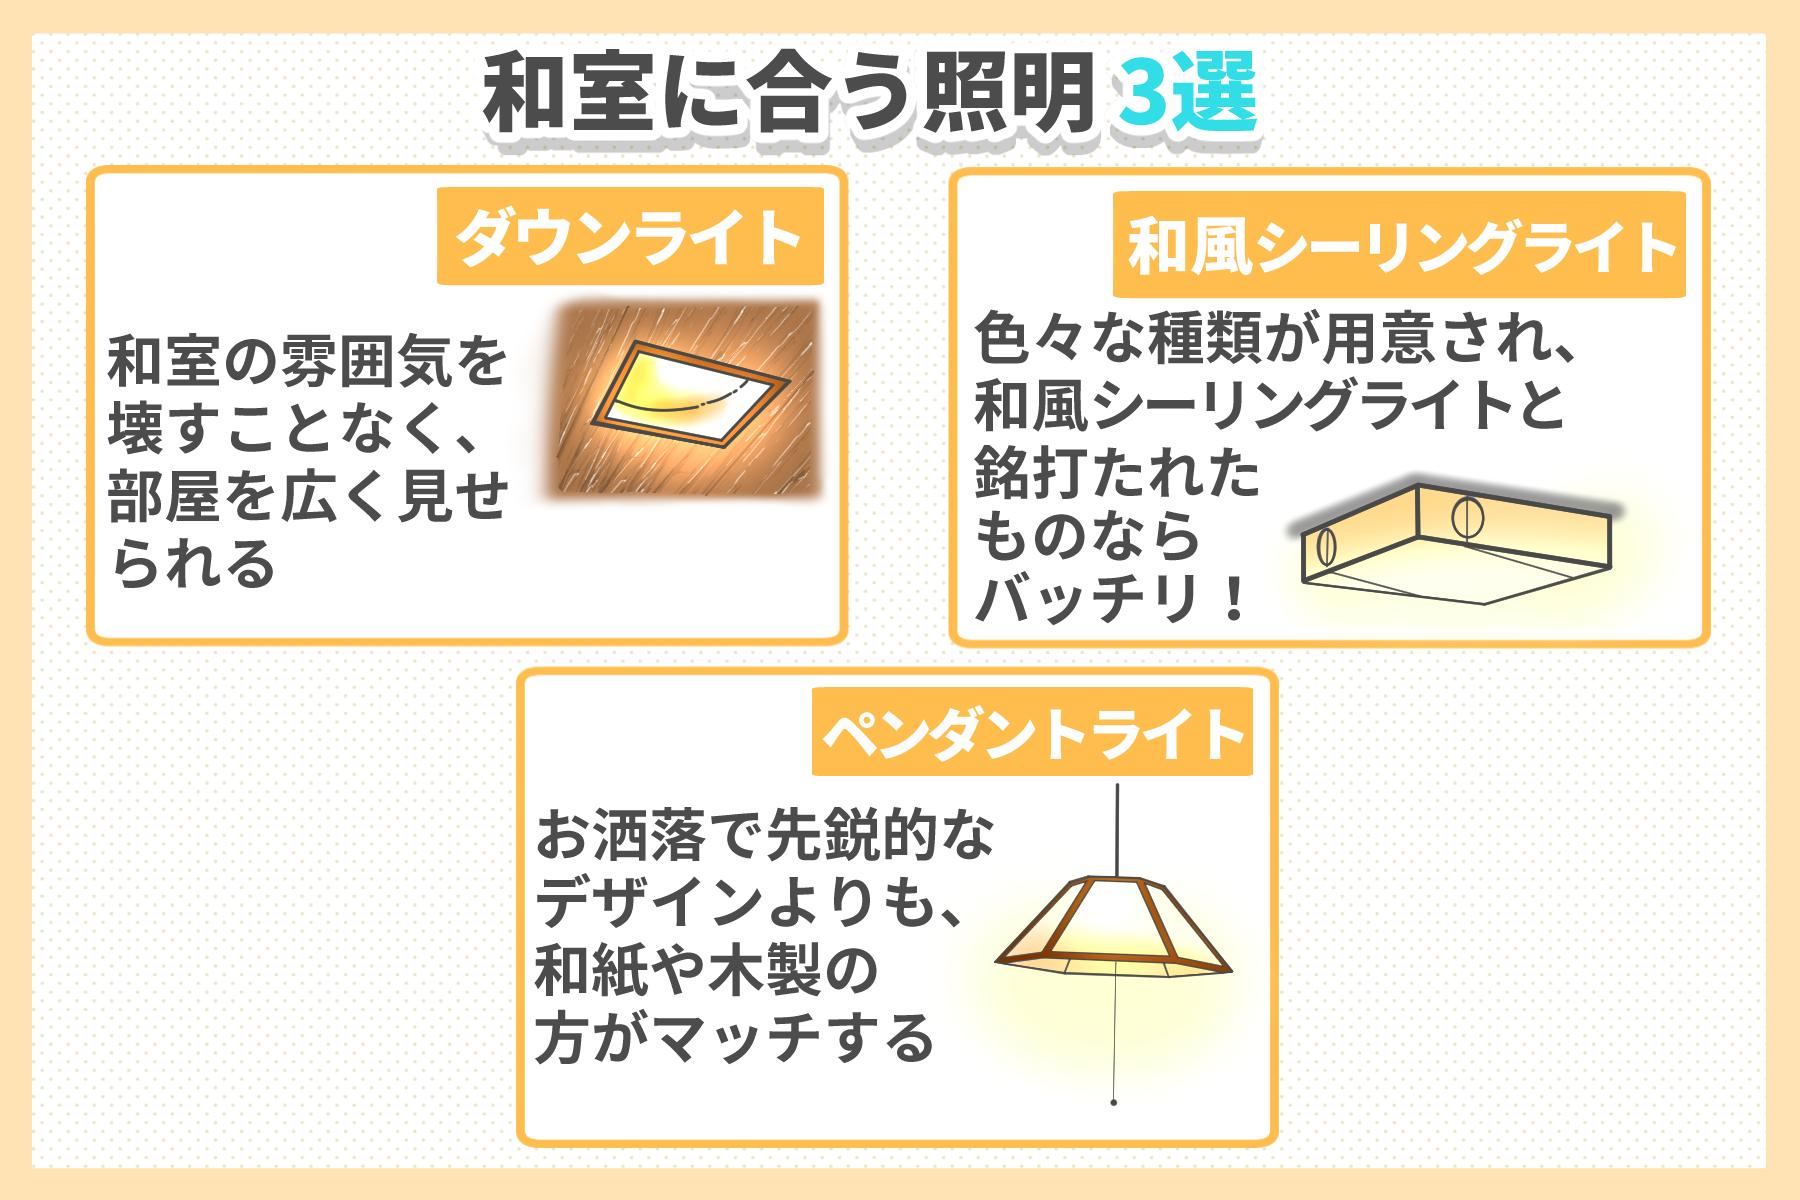 washitsuroom2.jpg